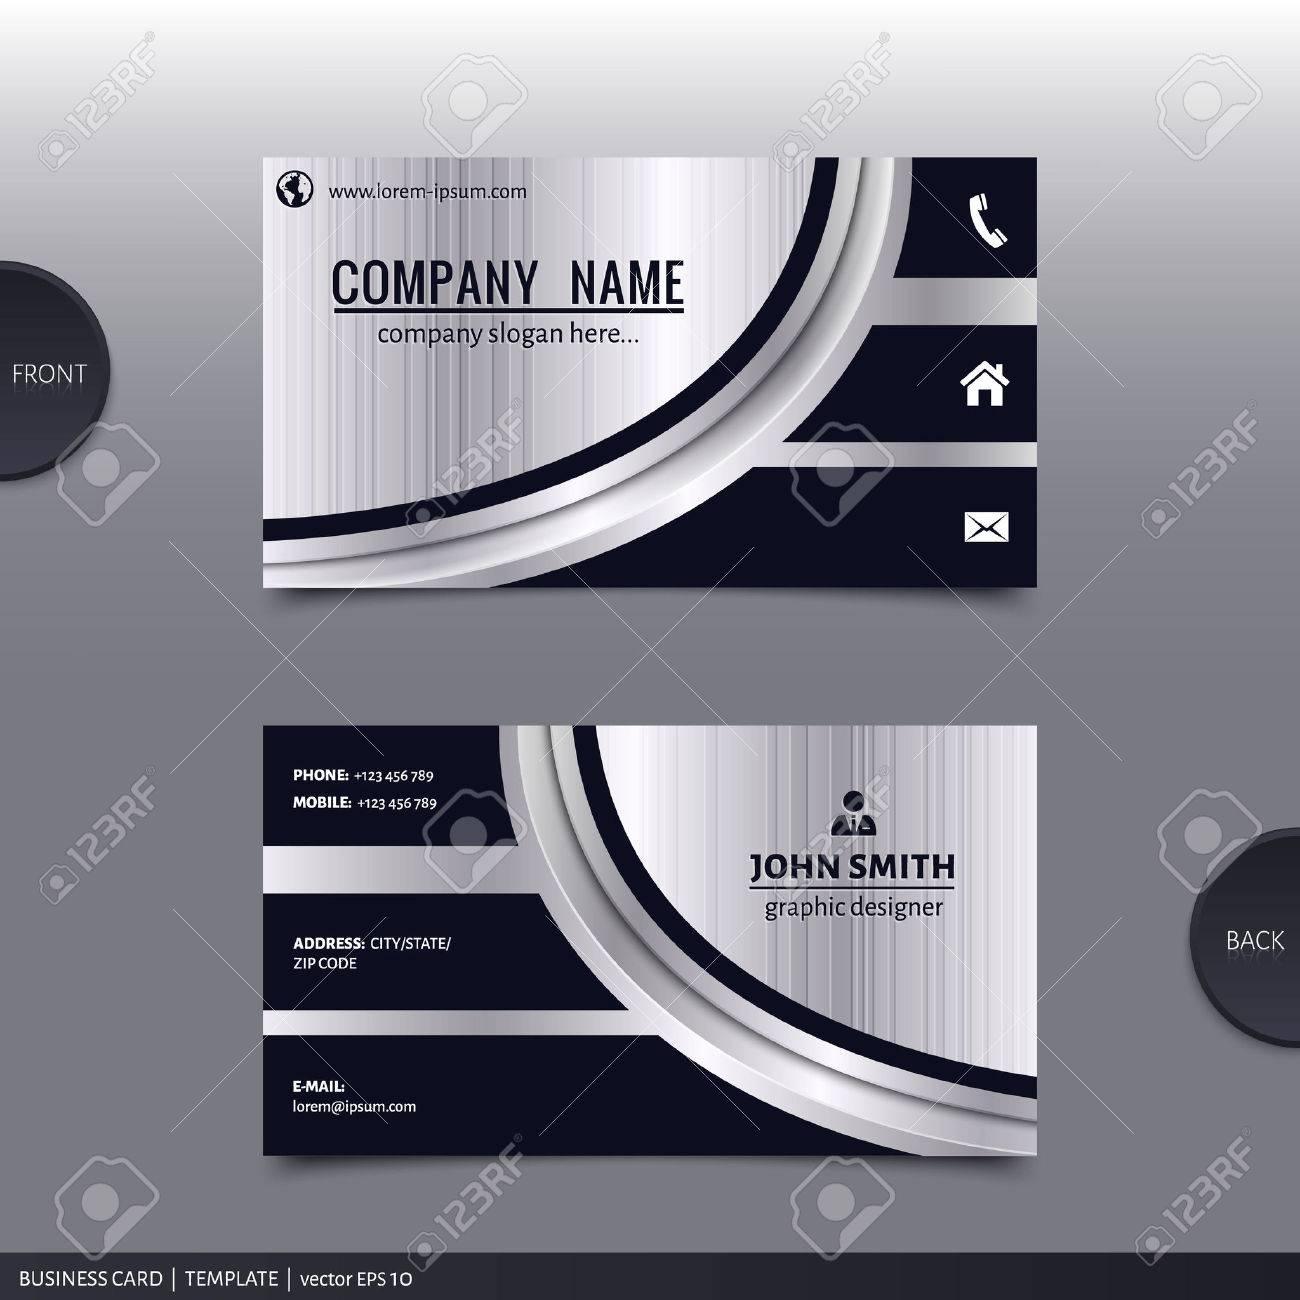 Business card template, modern abstract design. Vector. - 33676605